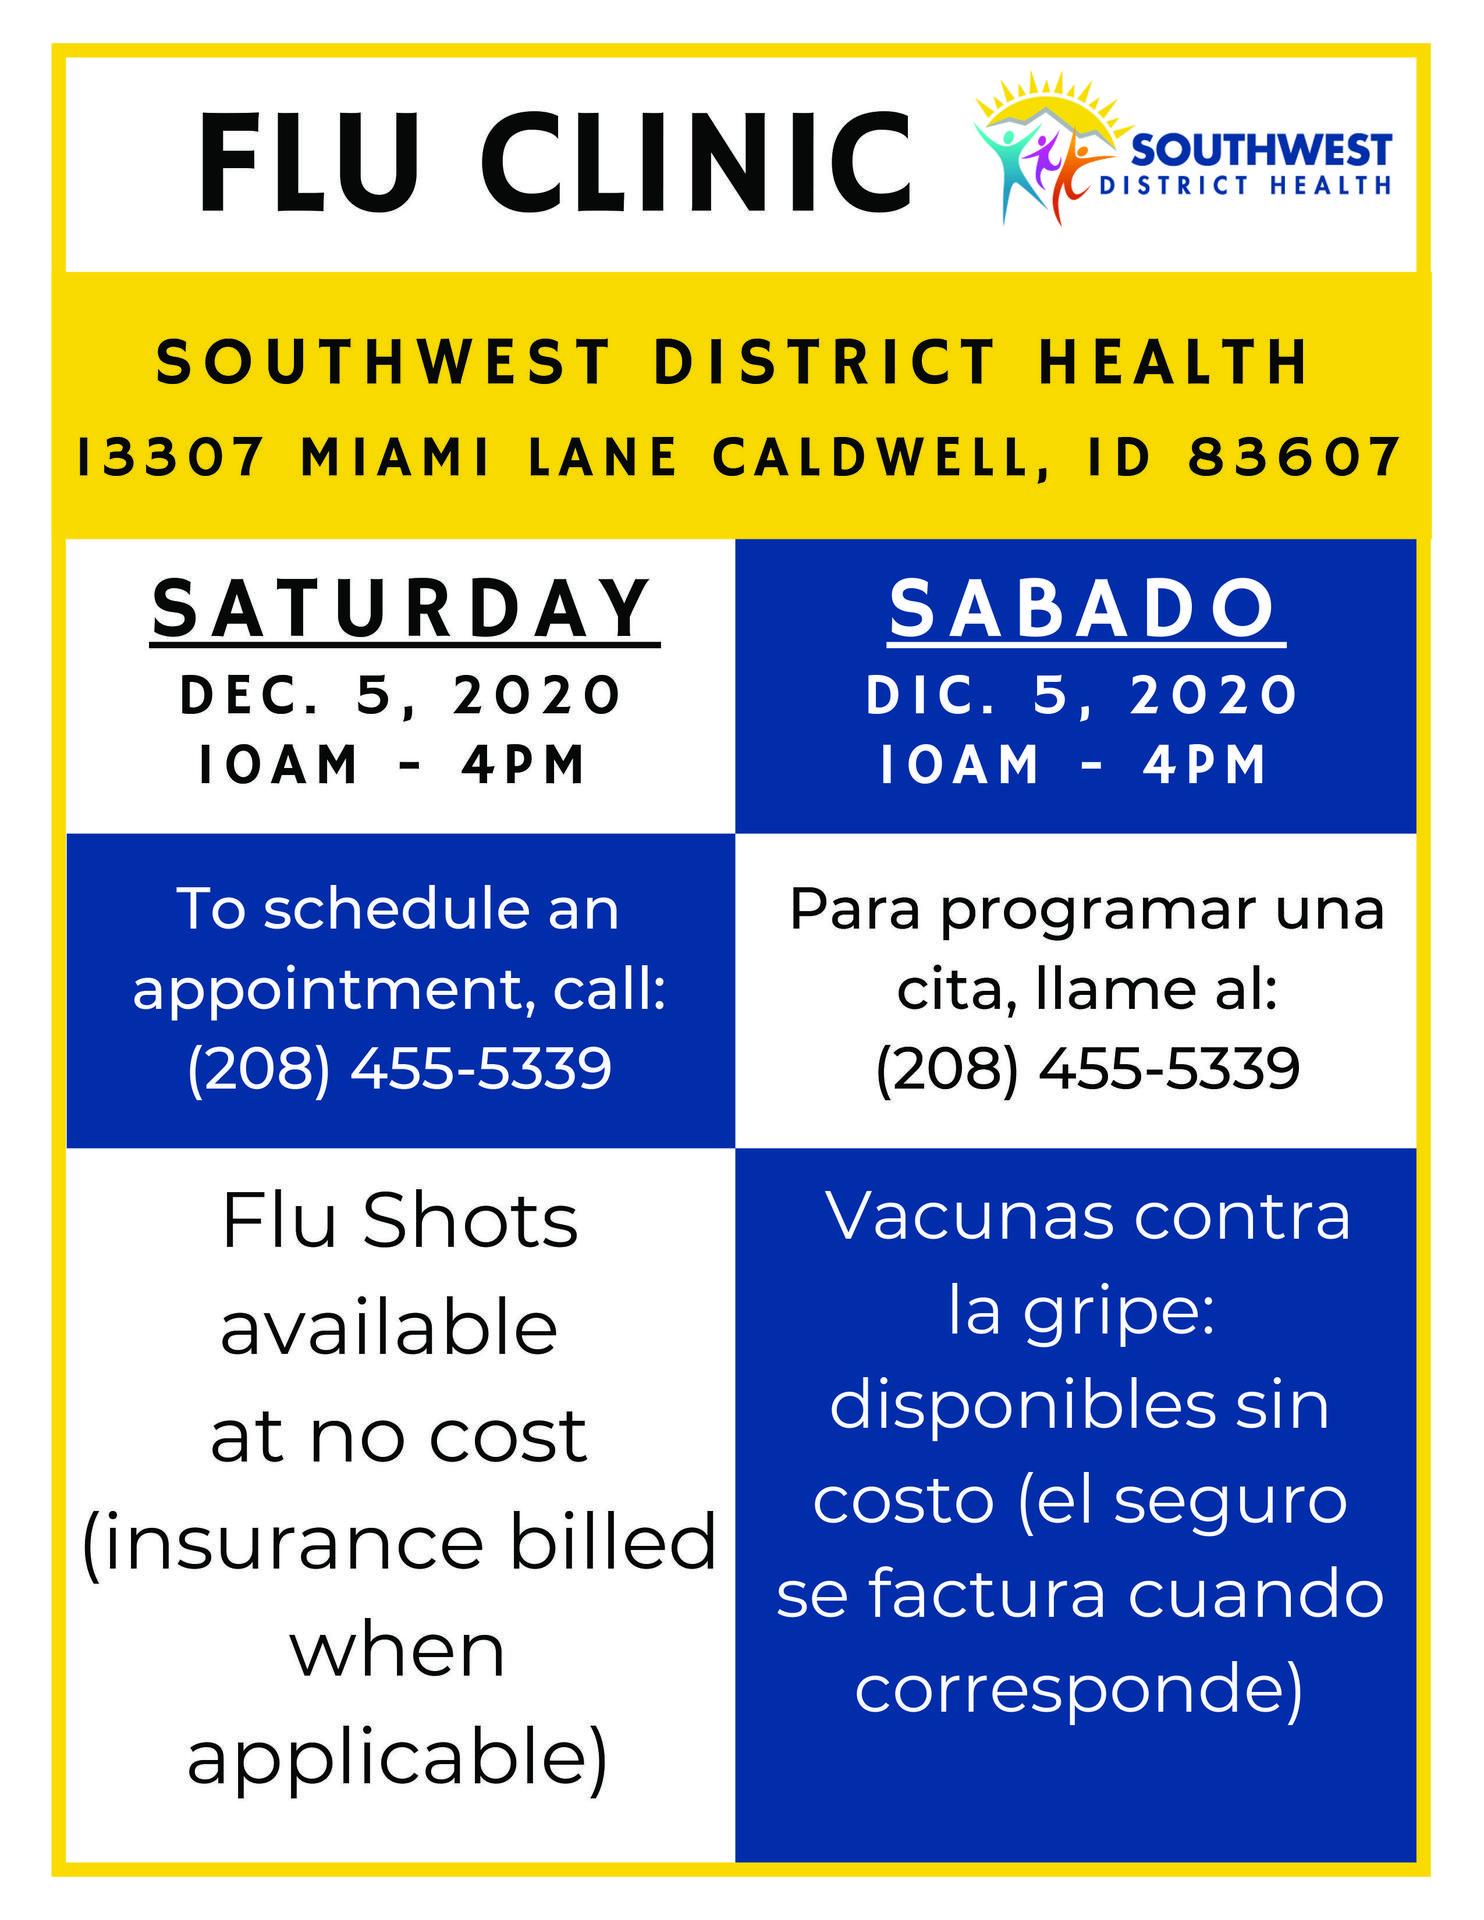 Flu Clinic Information